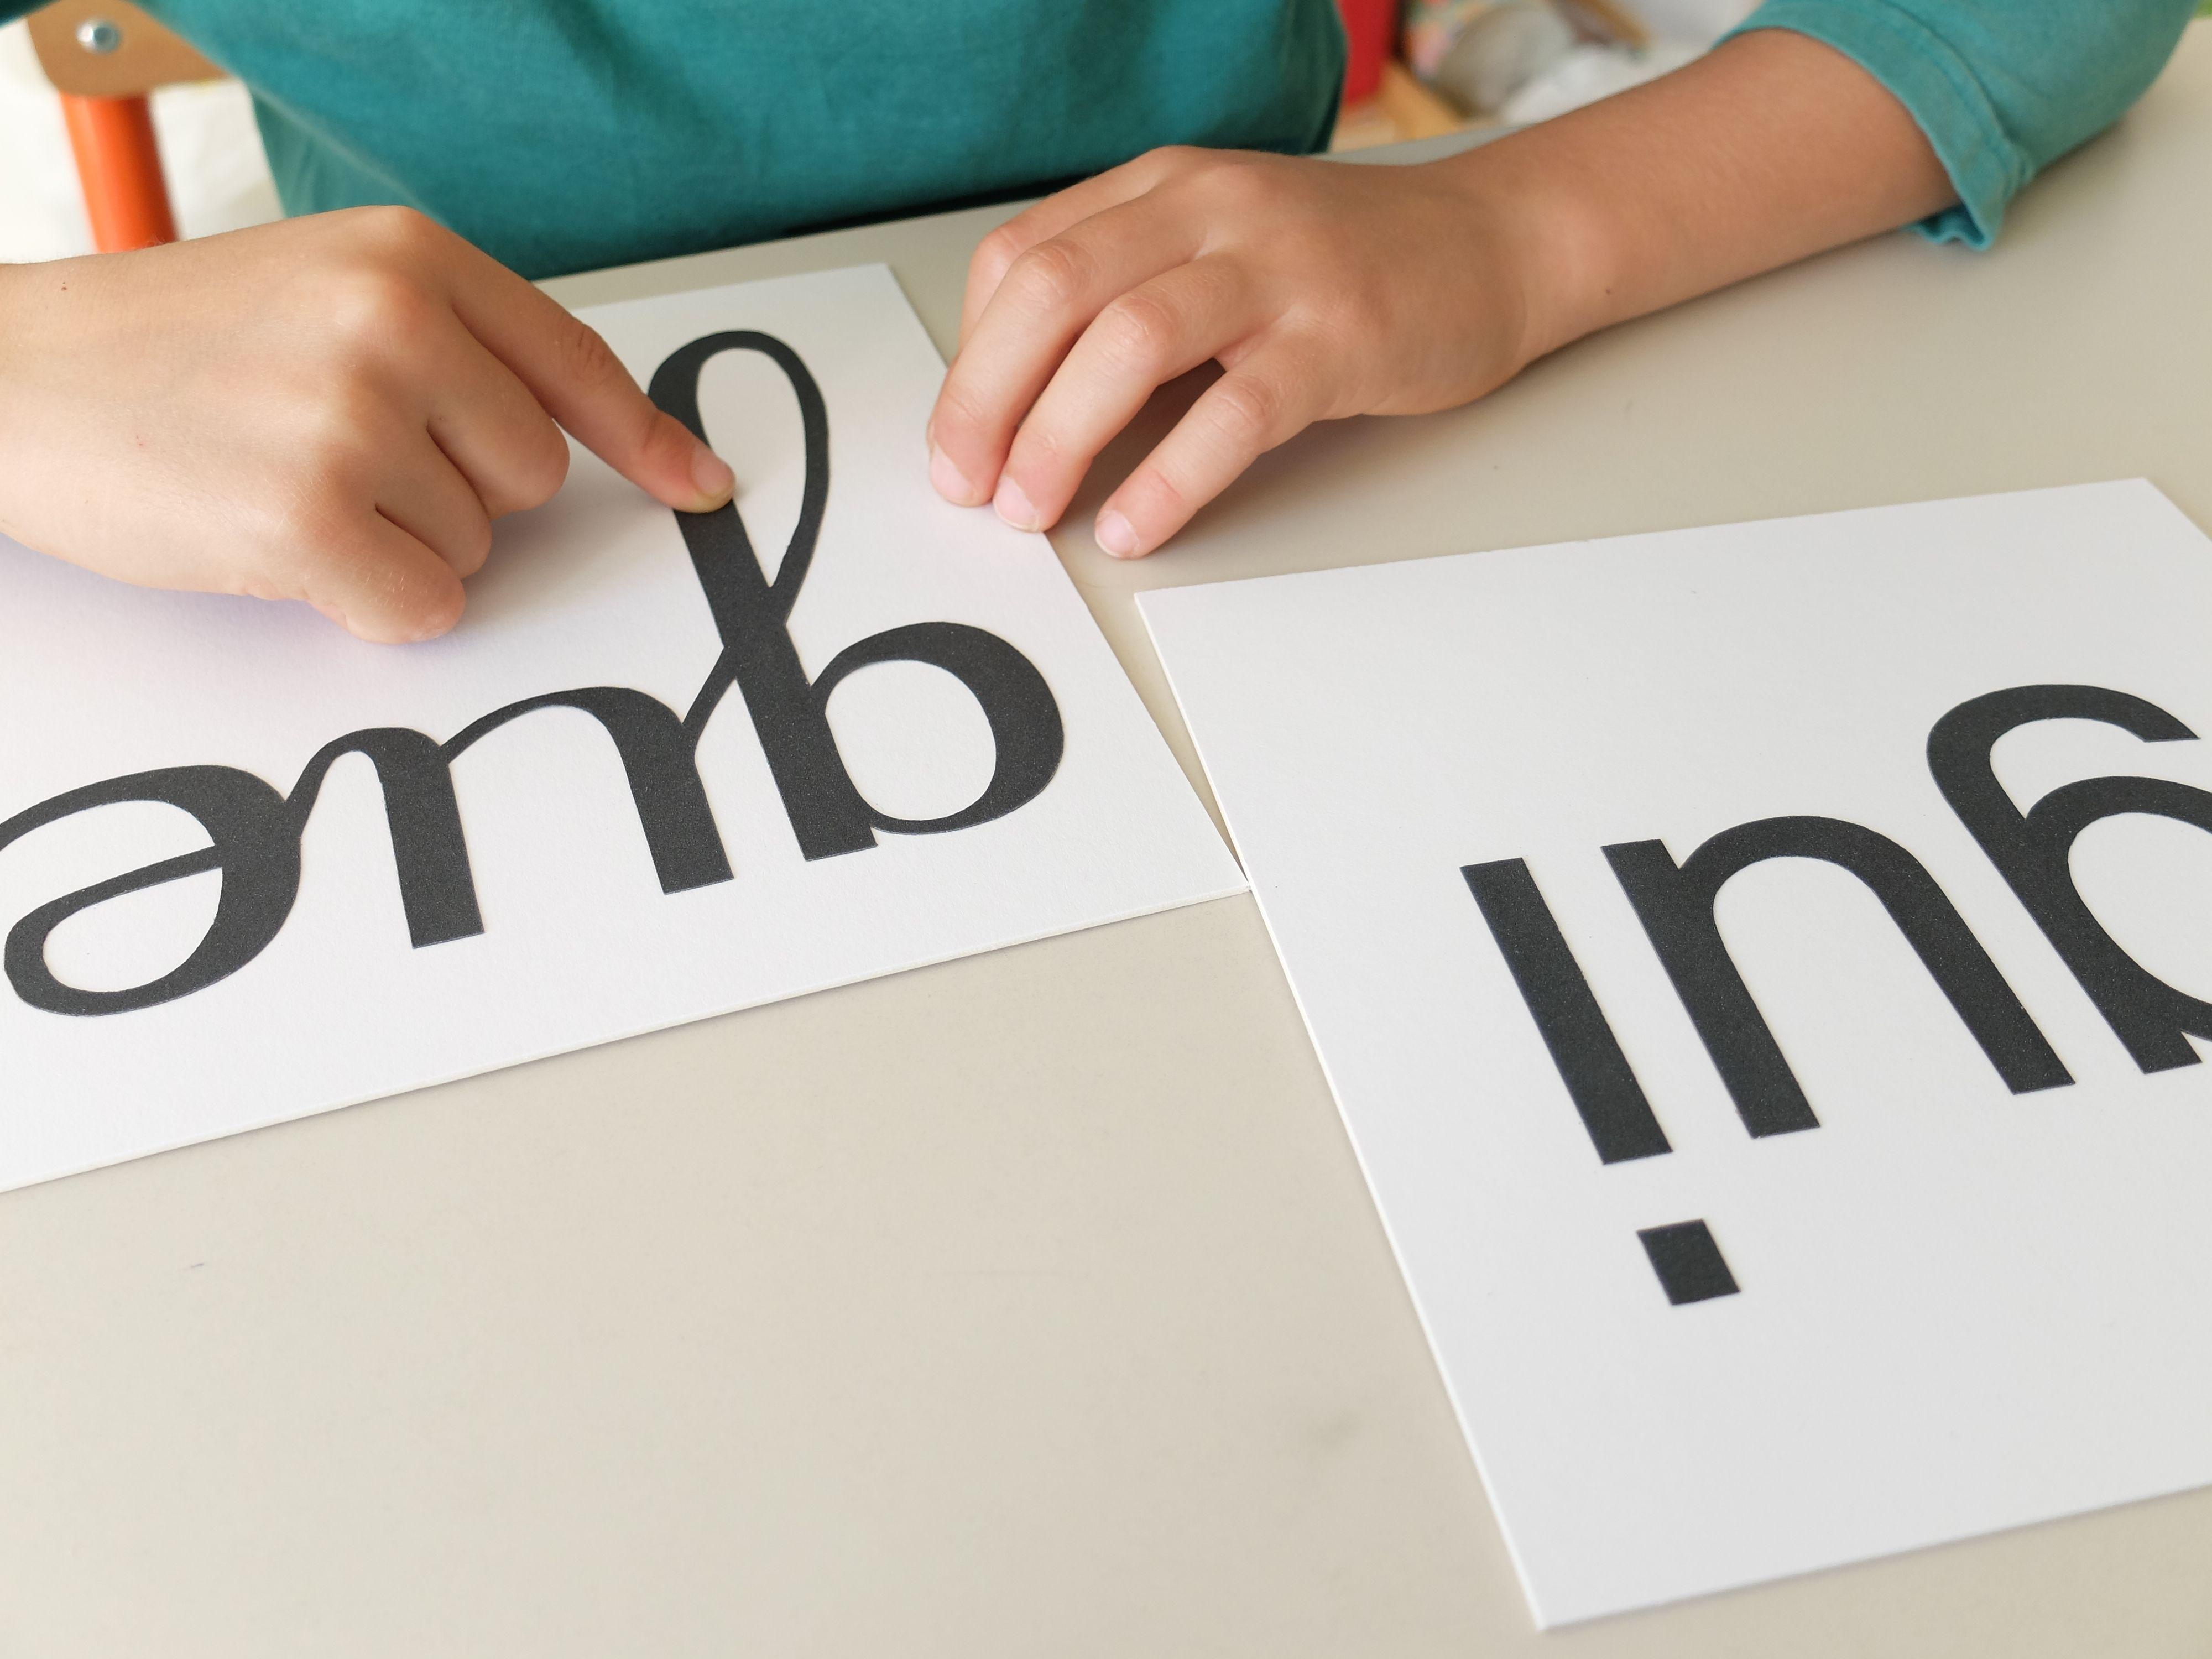 Uncategorized Ecrire apprendre lire et avec la fransya fransya